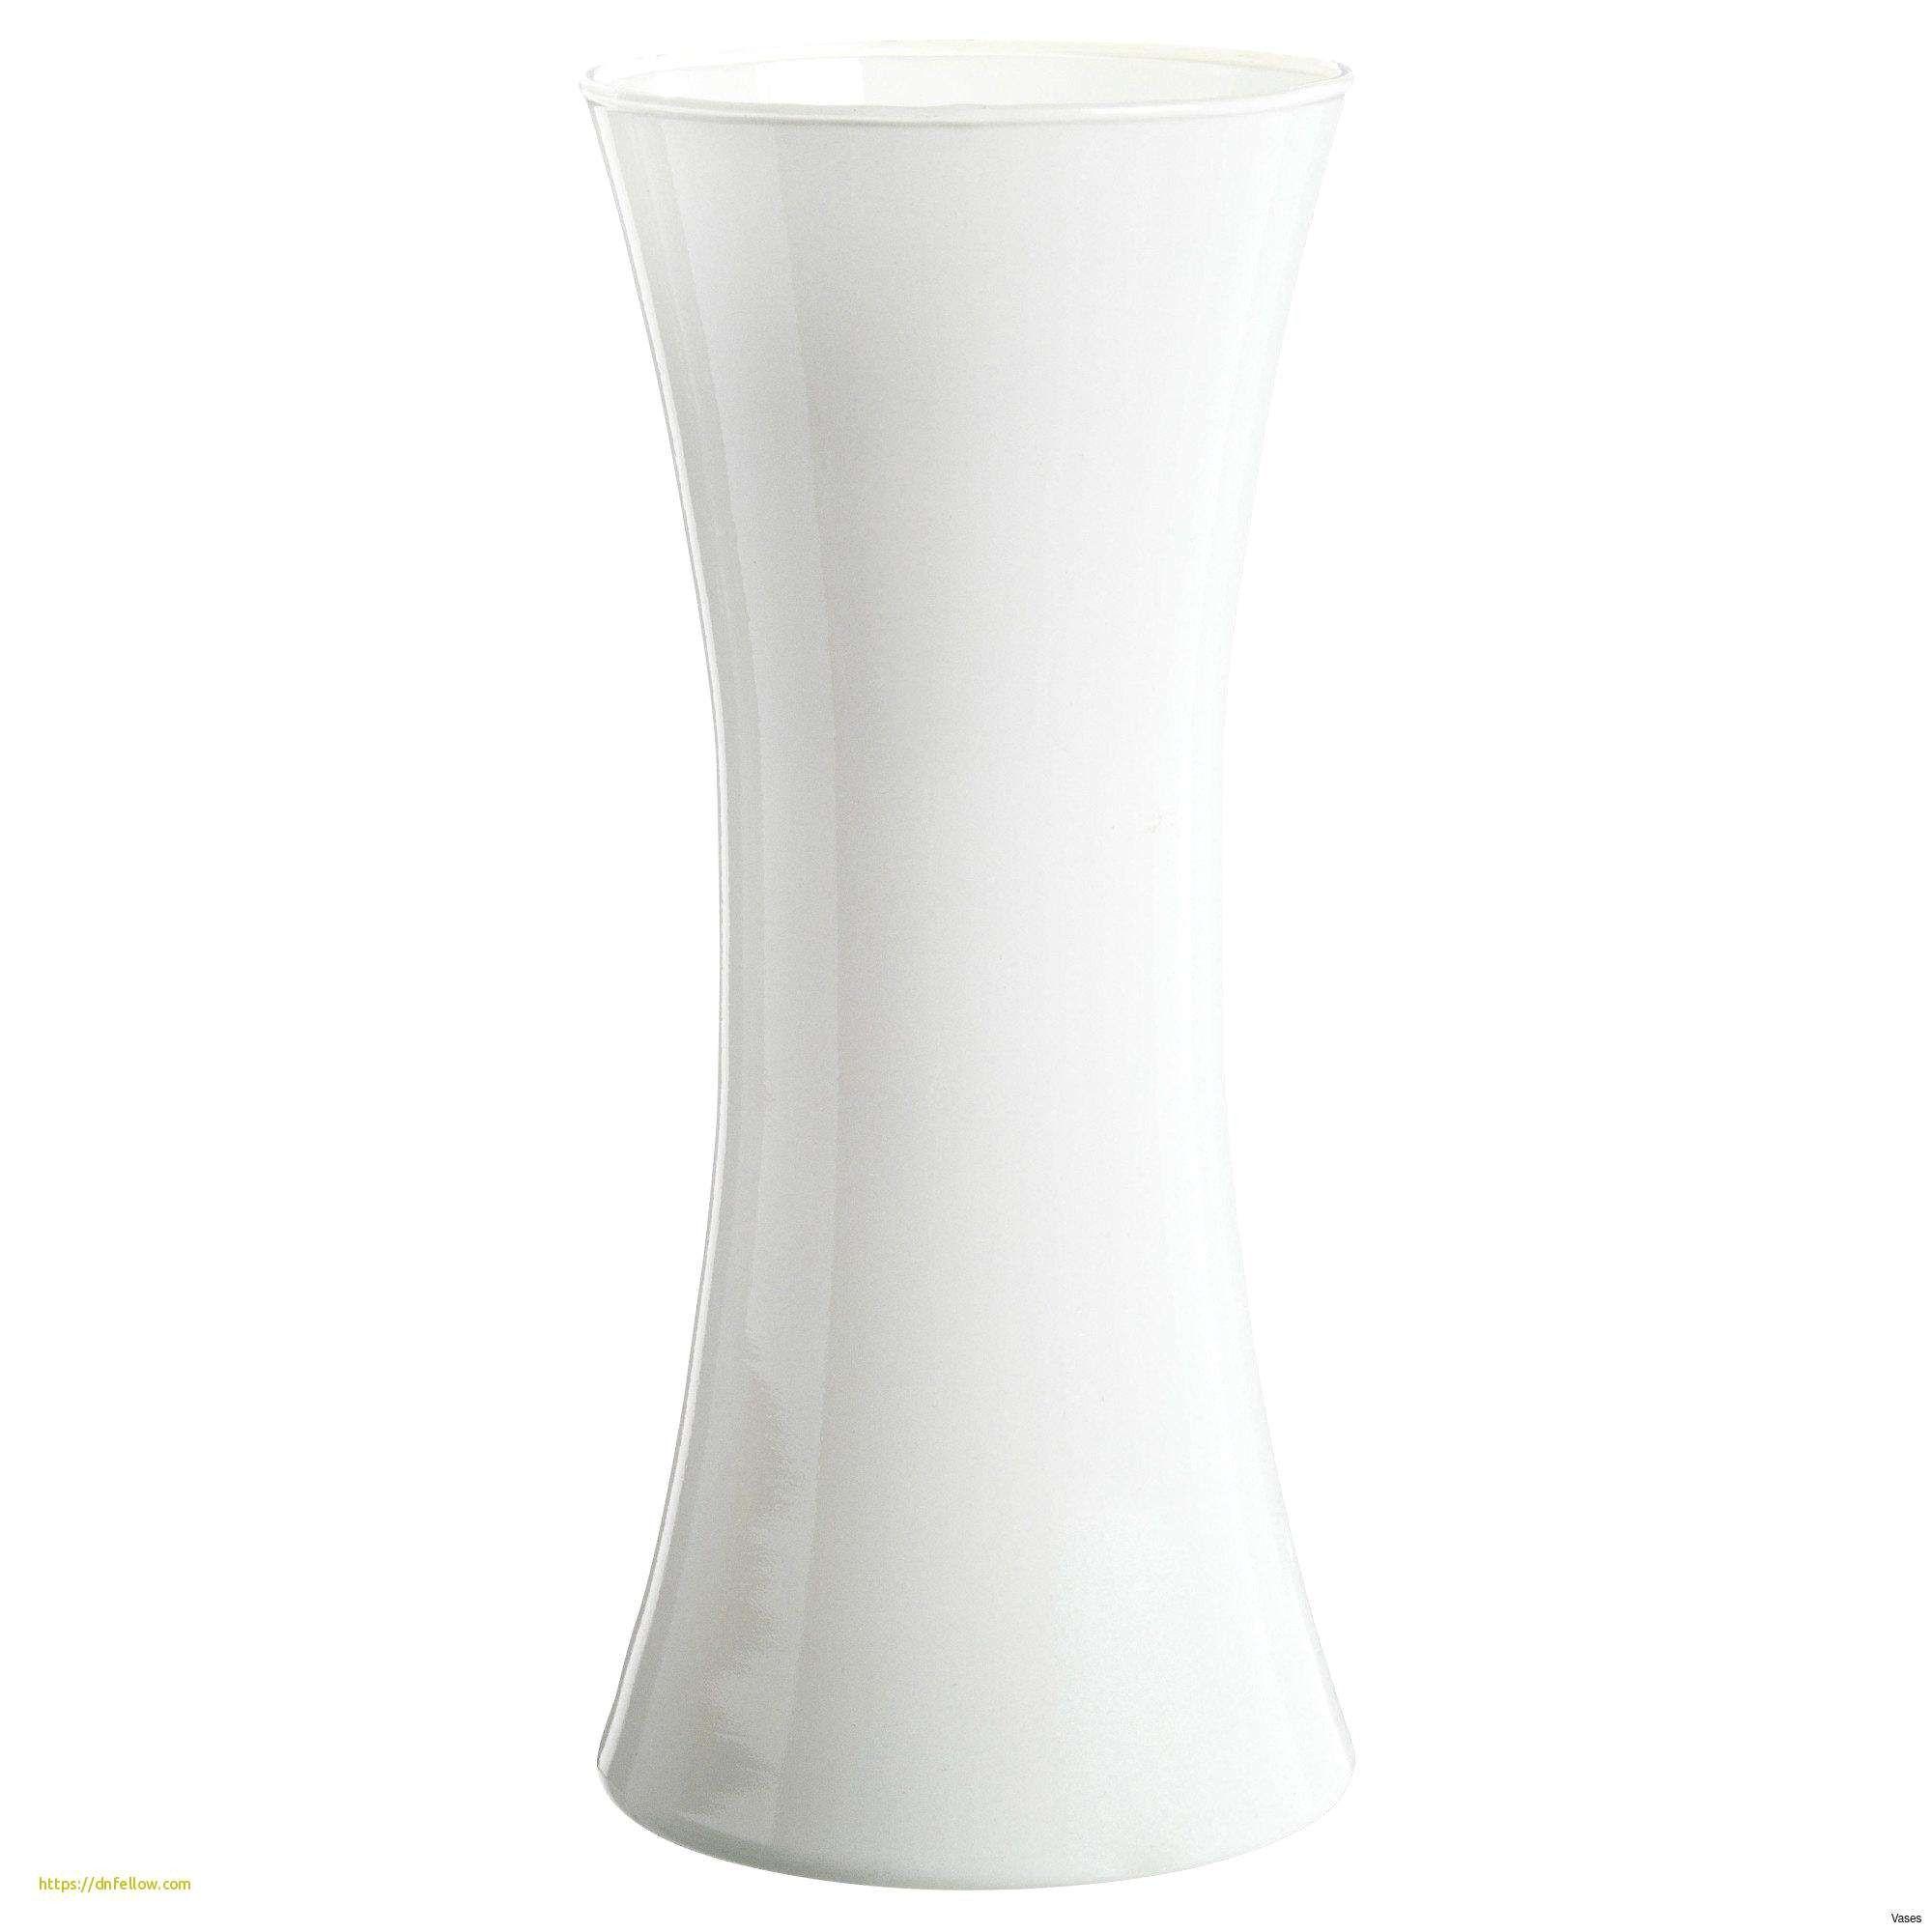 28 Ideal Black Ceramic Floor Vase 2021 free download black ceramic floor vase of white vase set new white floor vase ceramic modern 40 inchl home intended for white vase set new white floor vase ceramic modern 40 inchl home design ikea inch